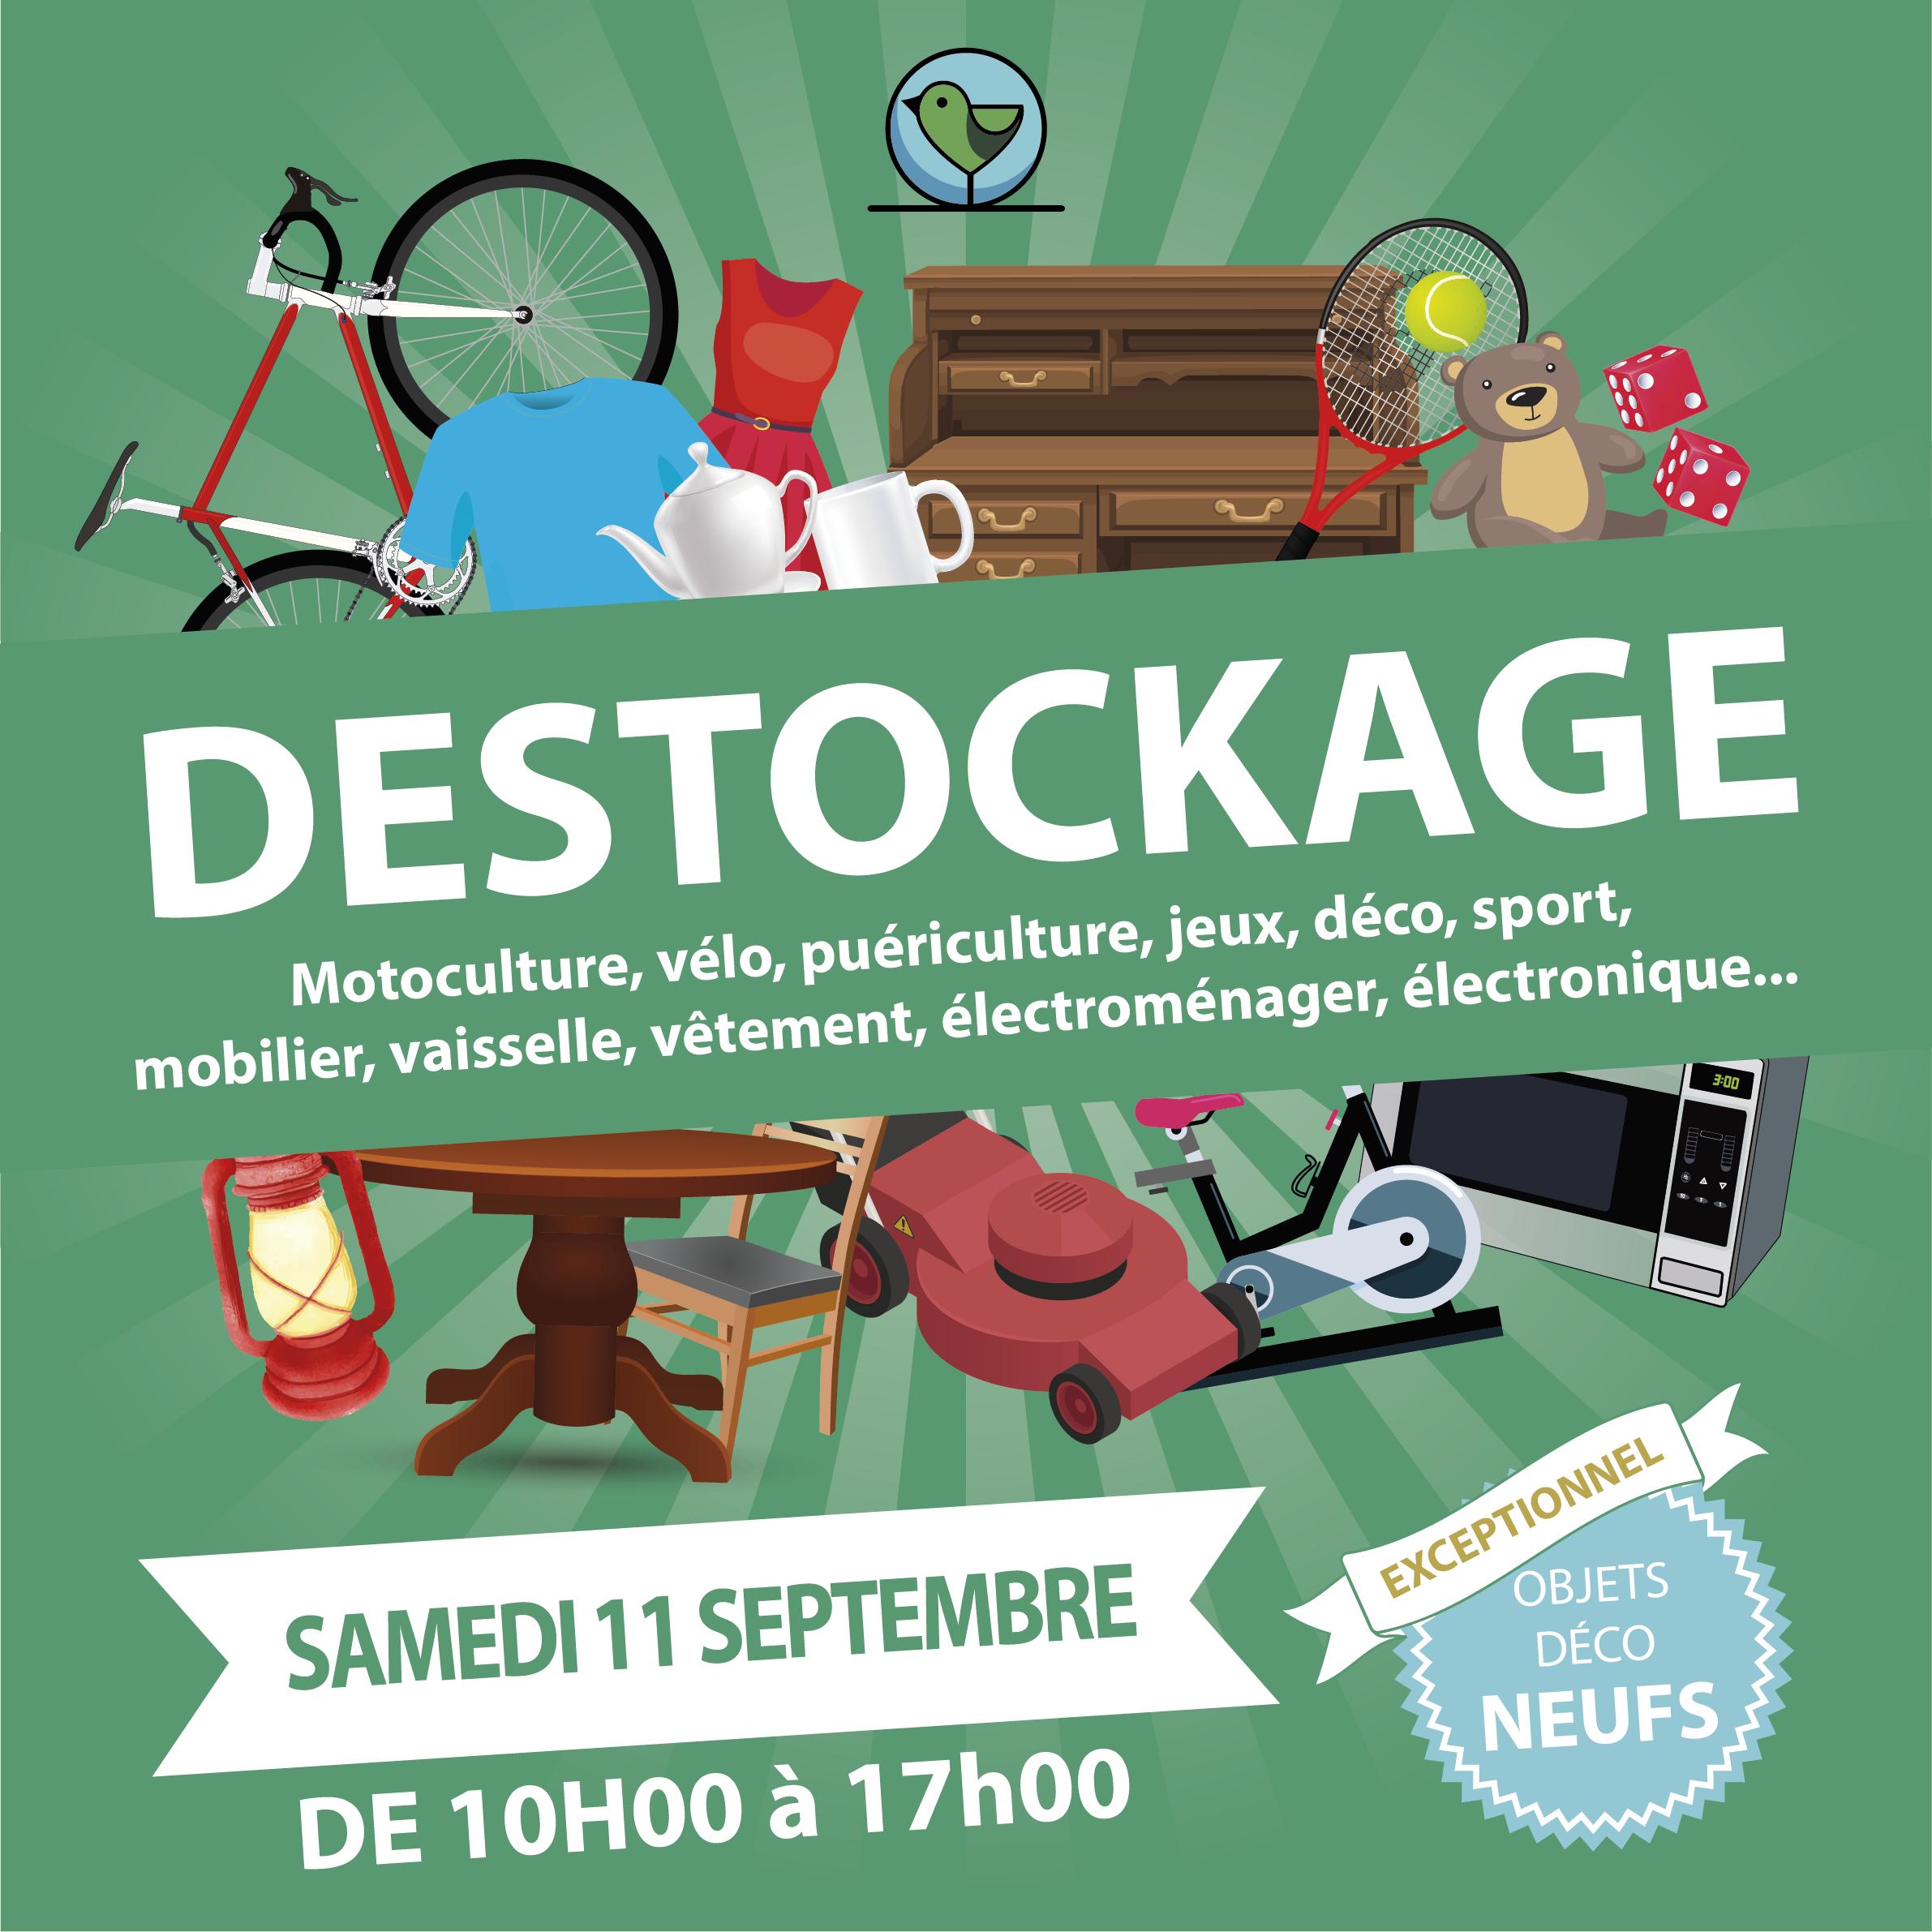 Vente Spéciale Destockage 11 Septembre 2021